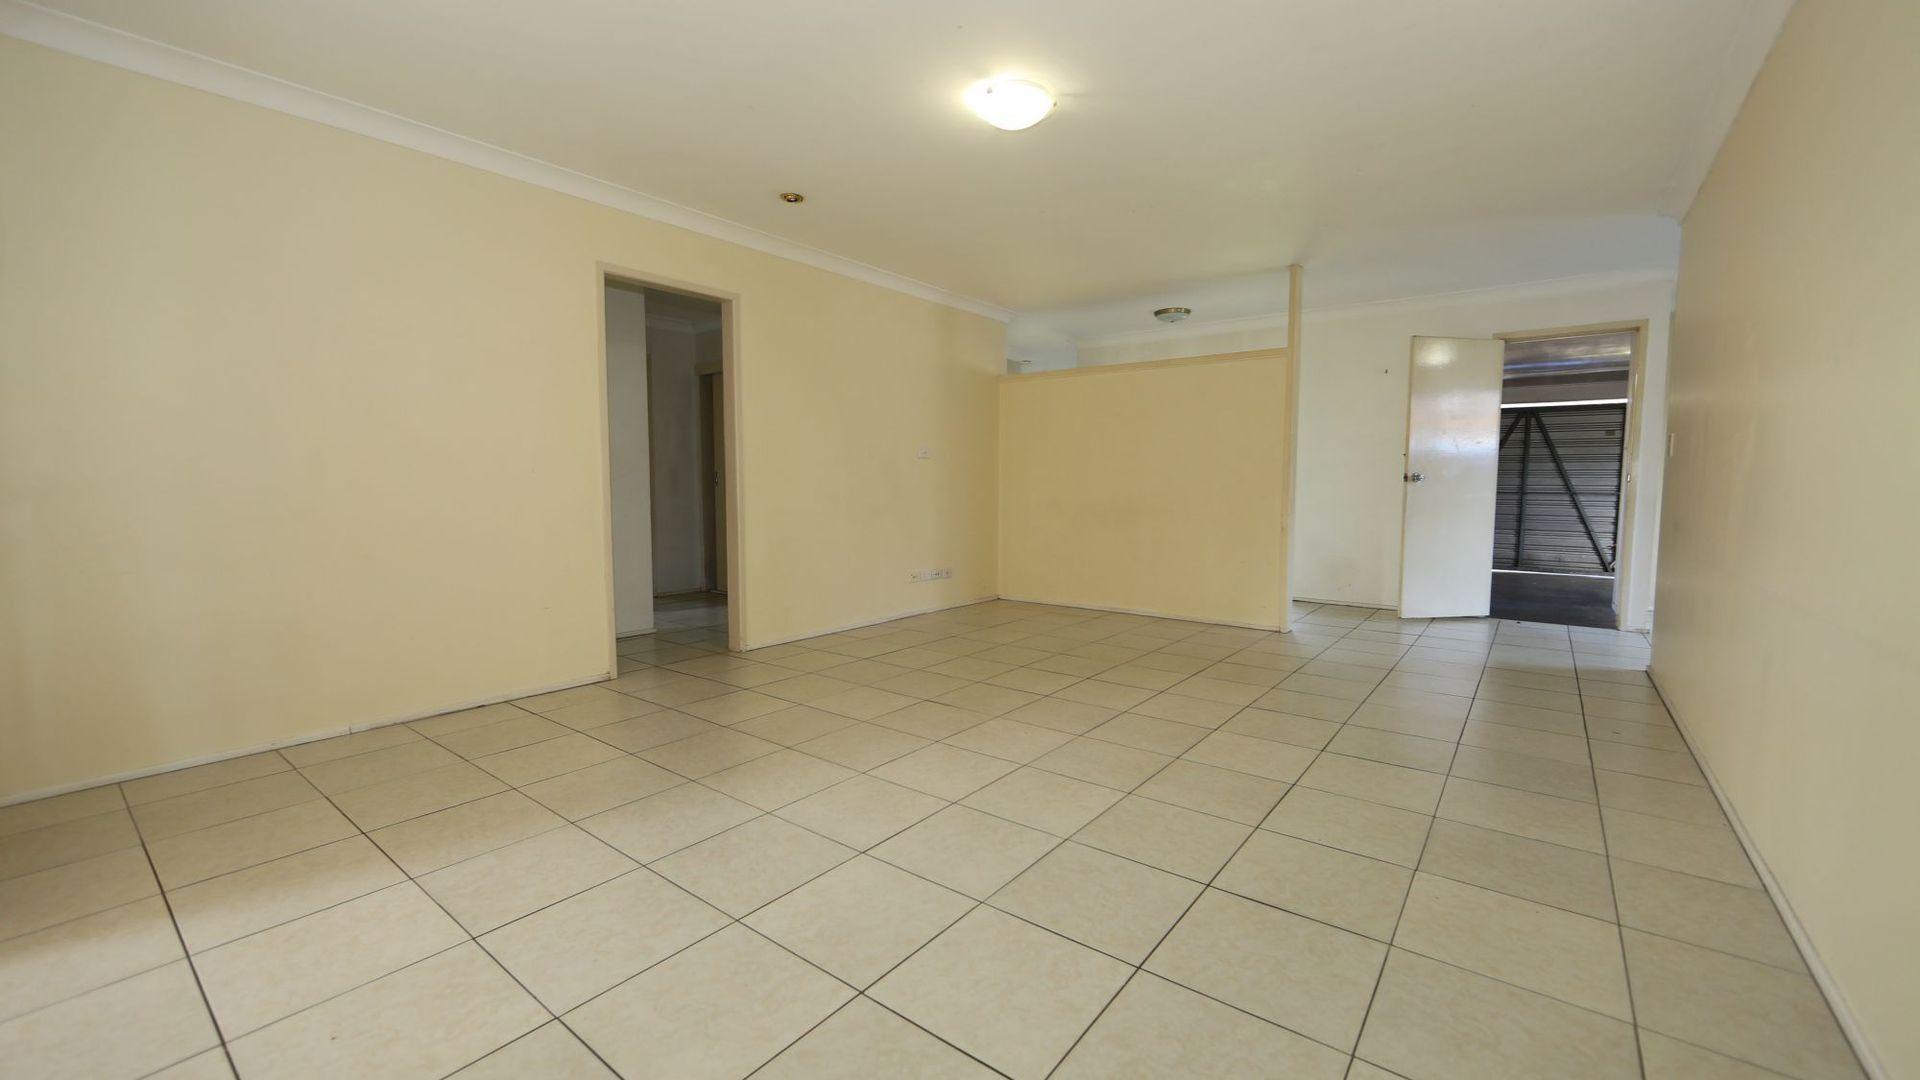 14 Moorgate St, Macgregor QLD 4109, Image 2